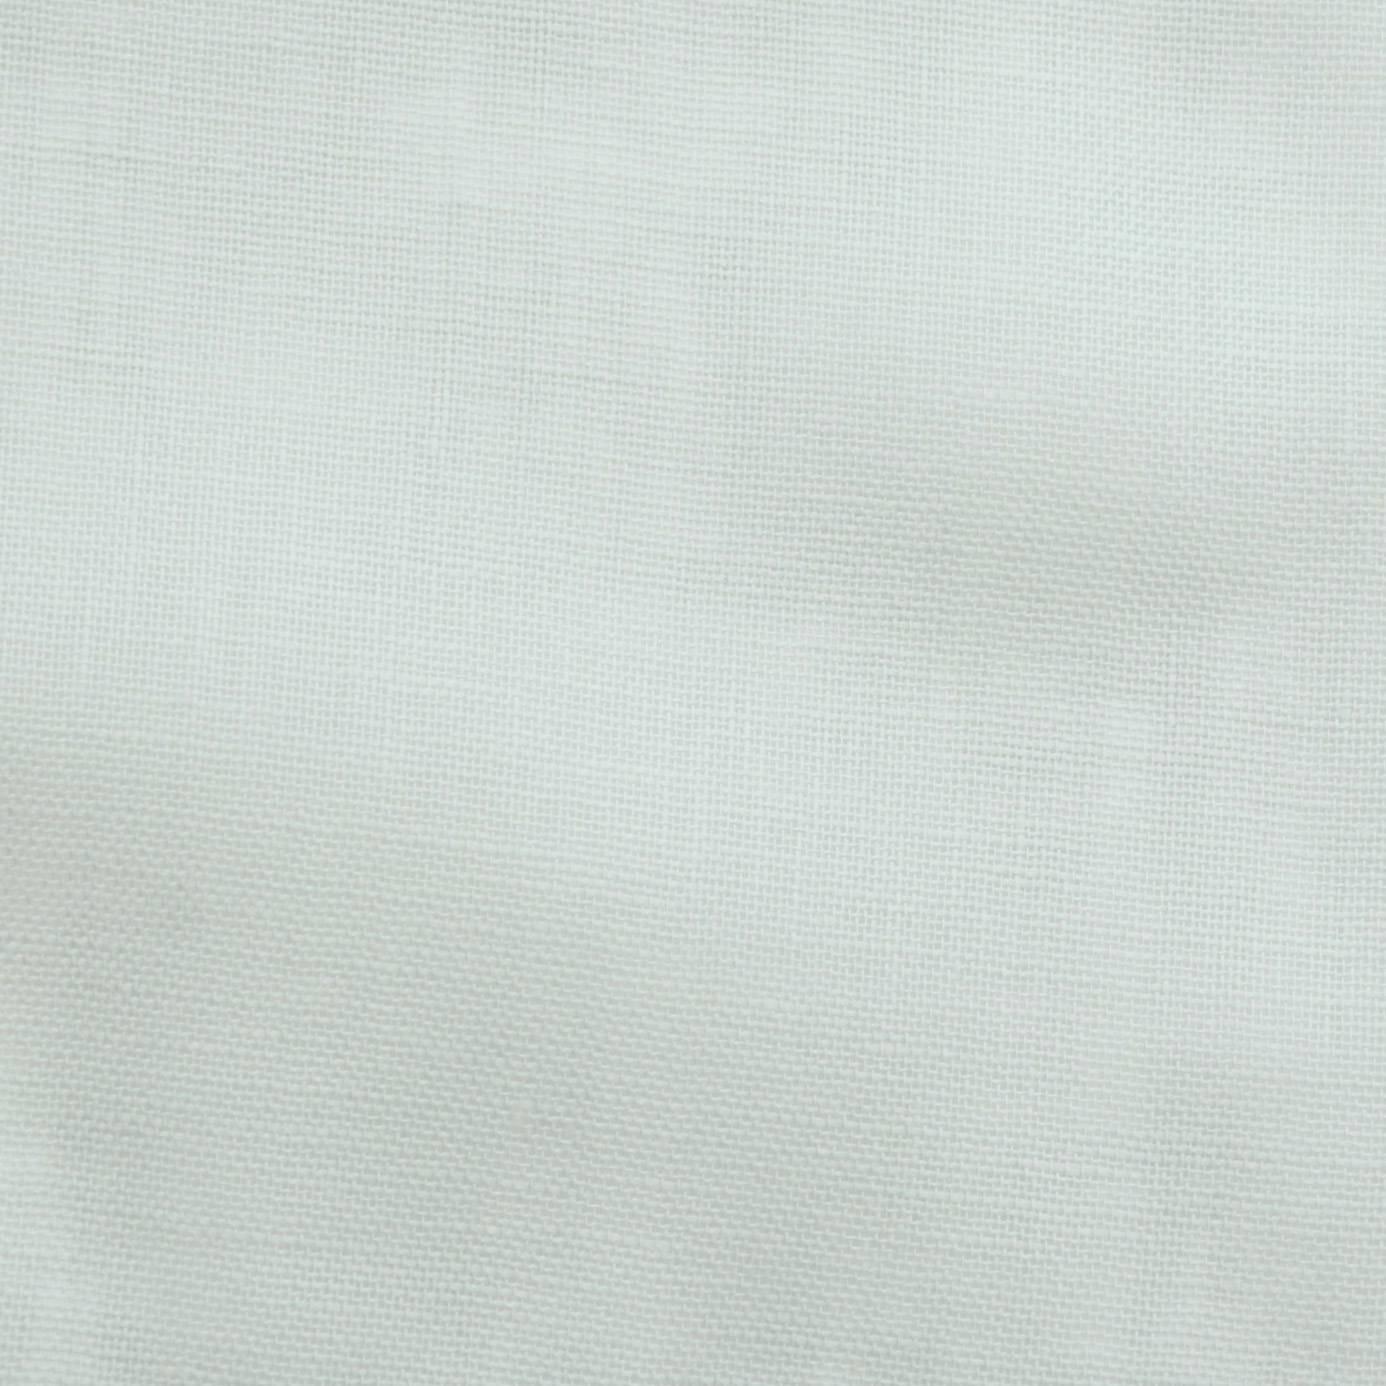 Lightweight Sheers Fabric Aqua 243349 Sanderson Lightweight Sheers Fabric Collection